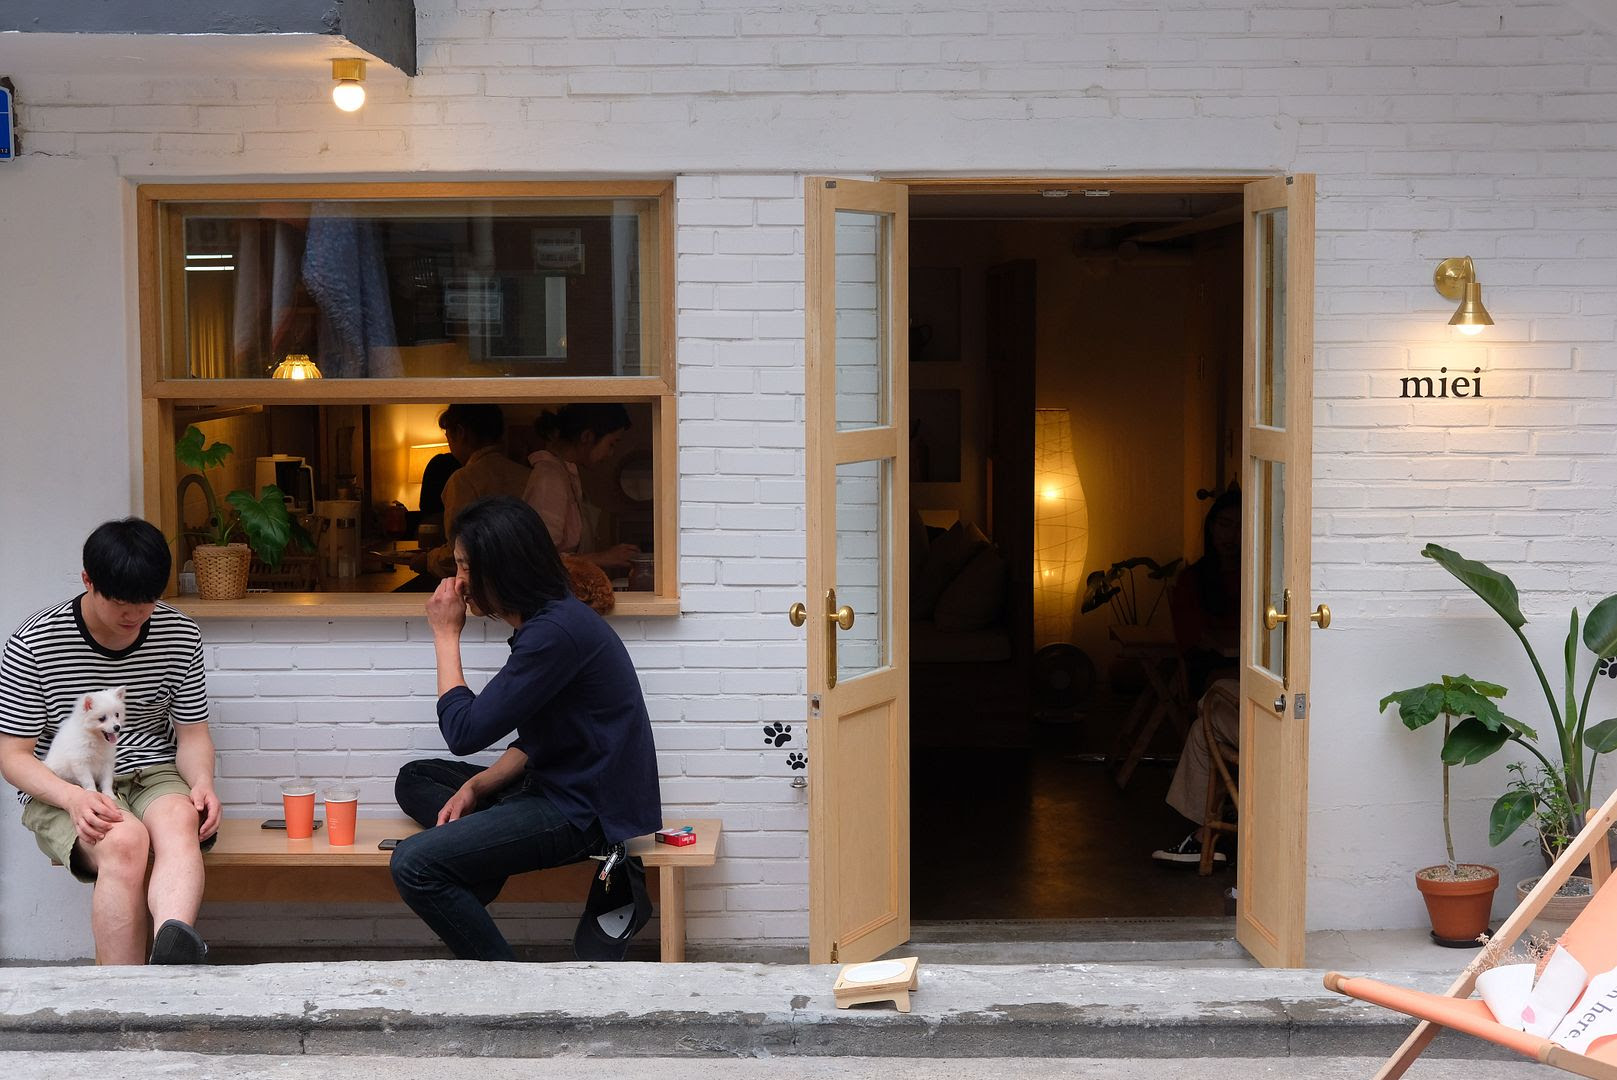 photo Cafe Miei Mangwon seoul.jpg